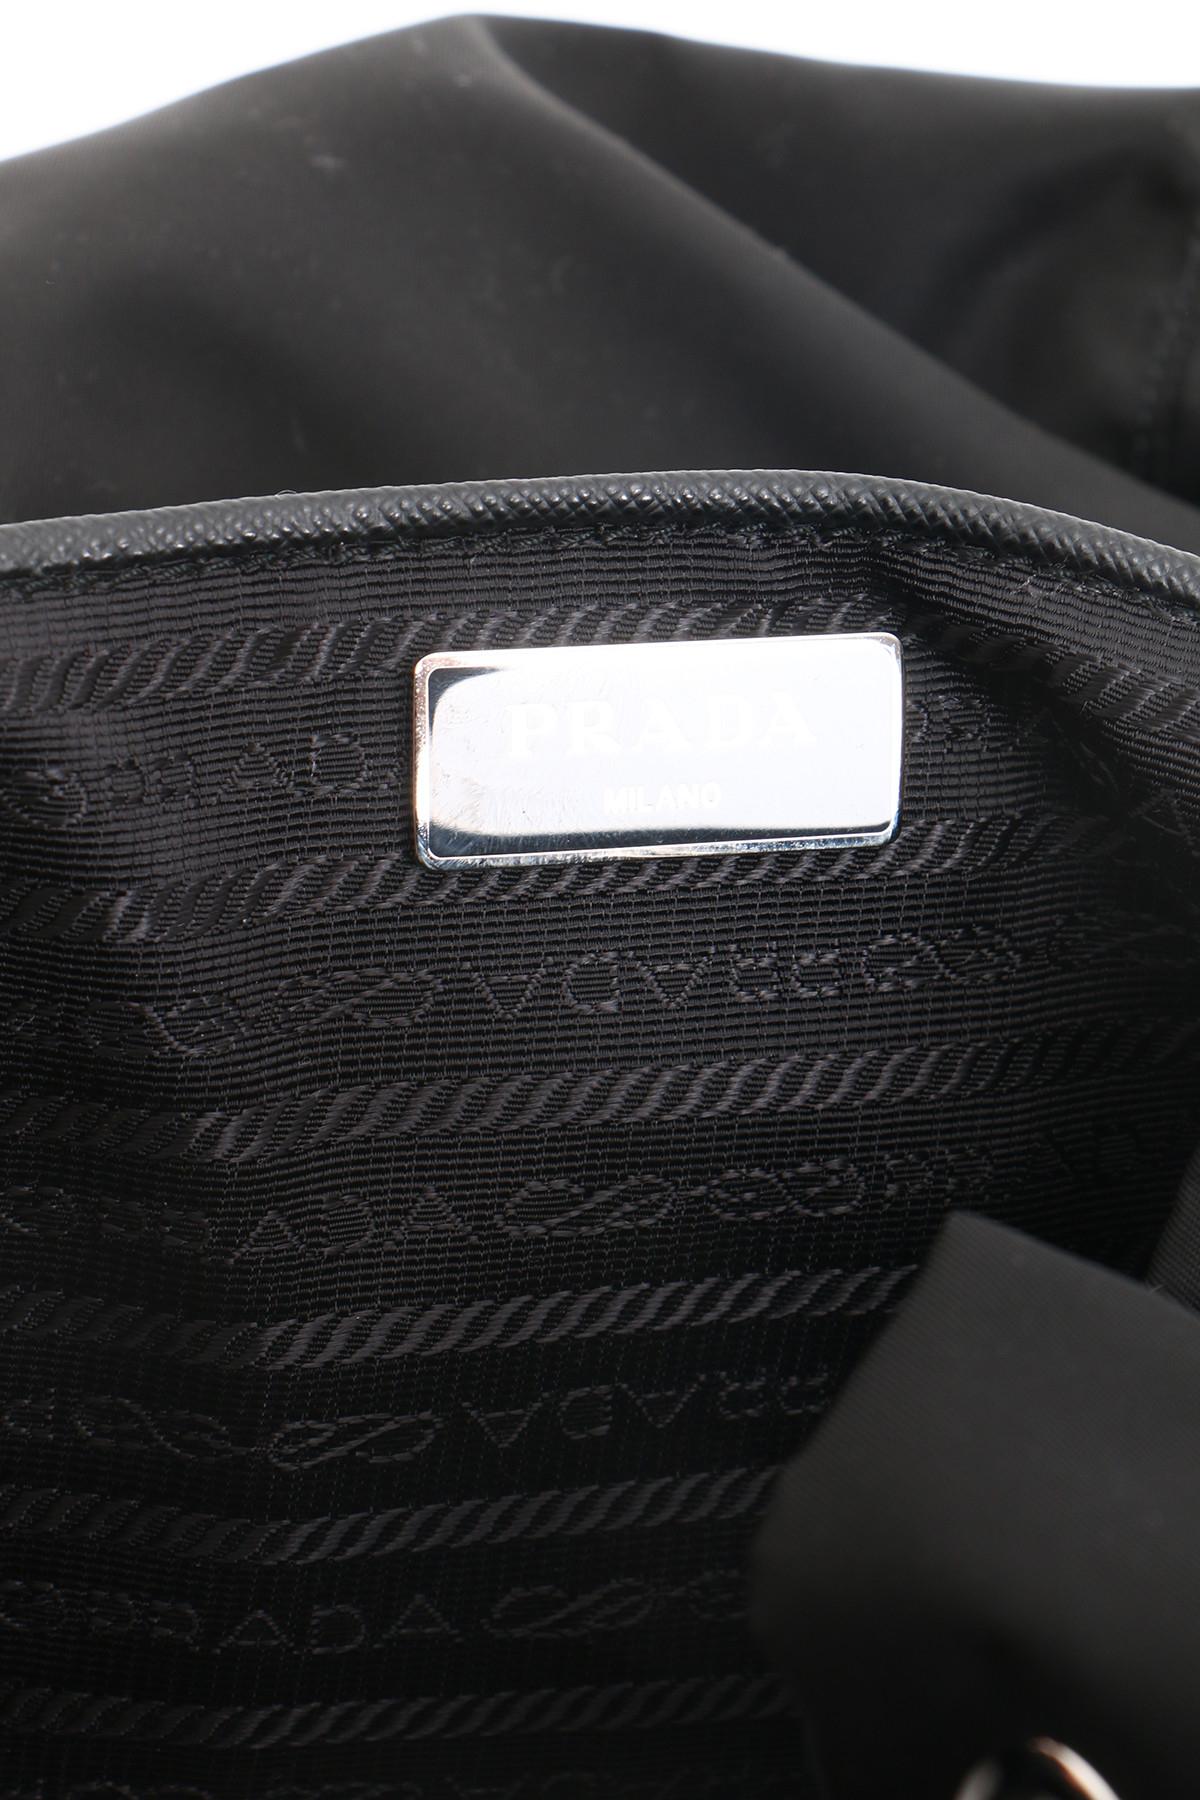 Prada Borse Vela in Black (Nero) | Lyst